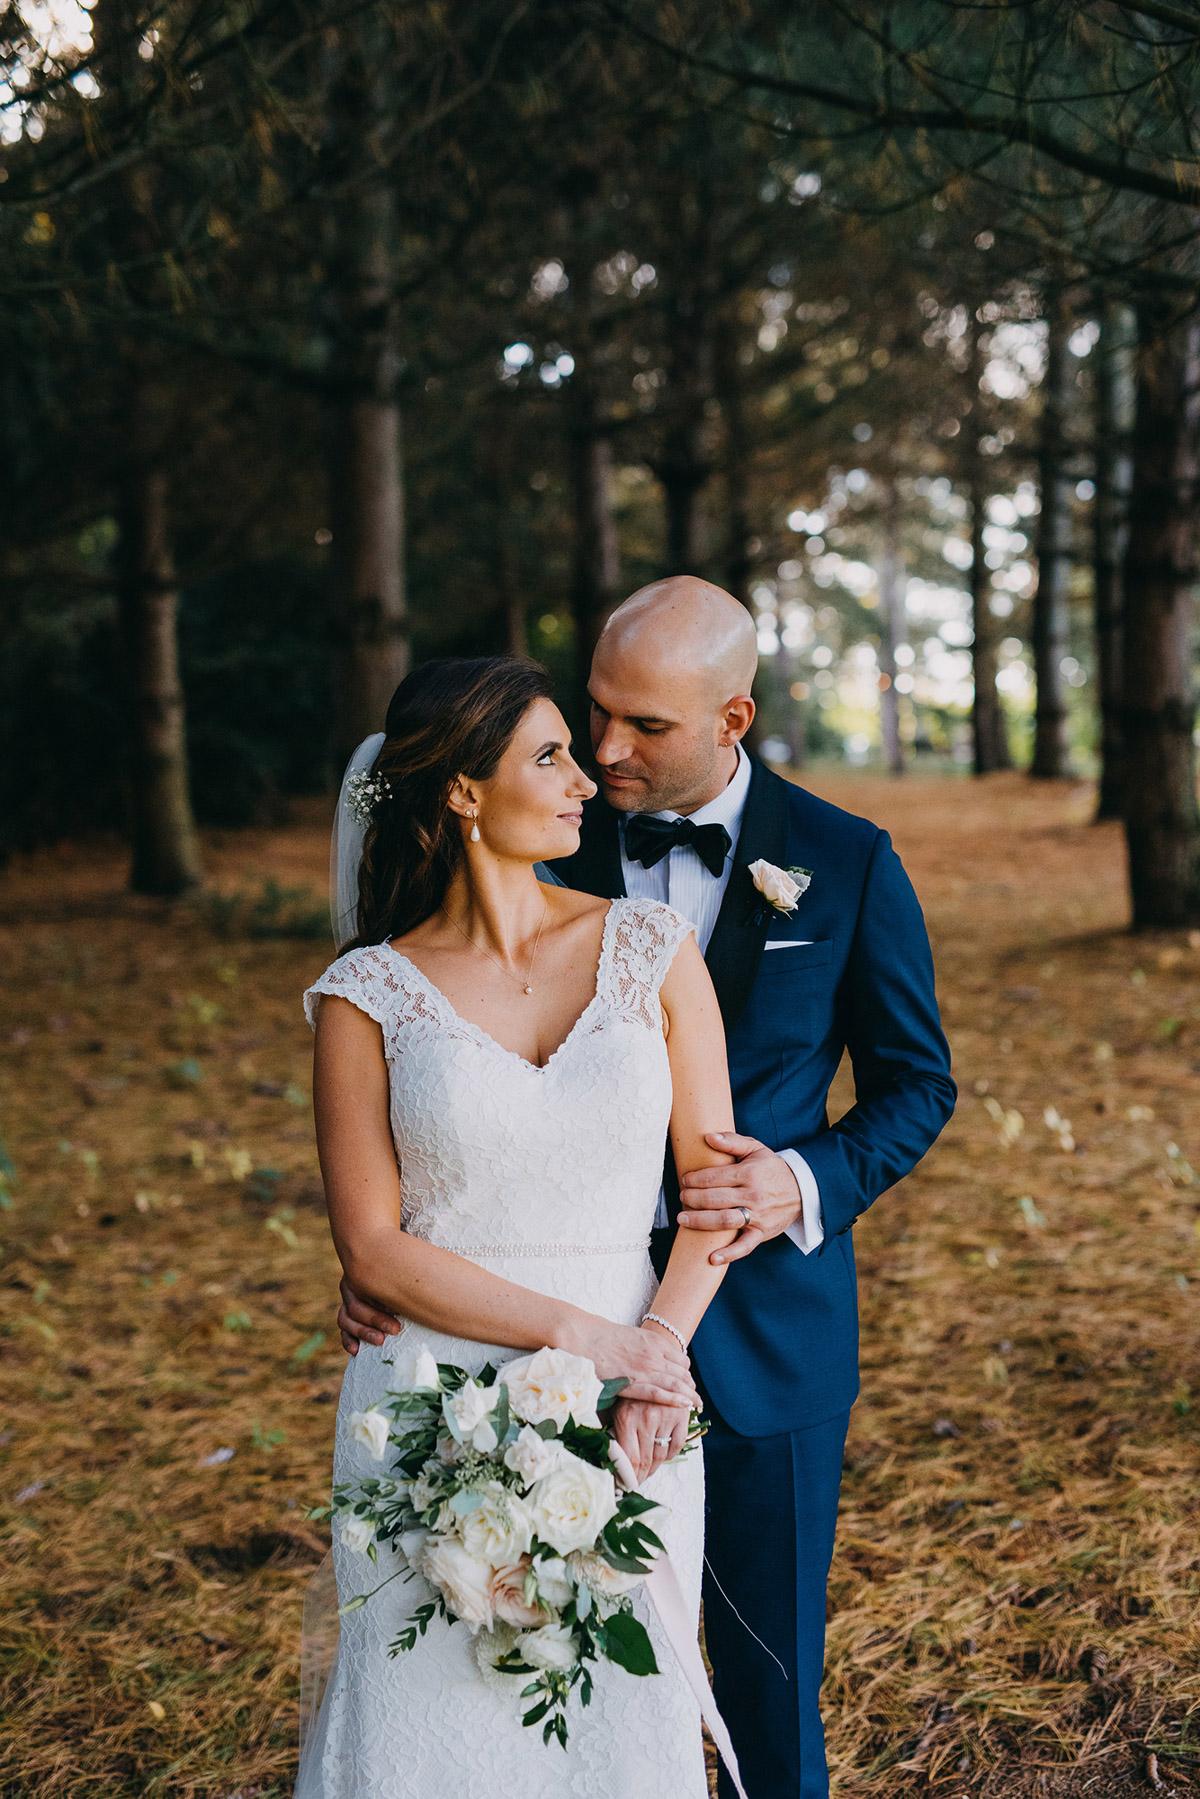 shaw-events-vineyard-bride-swish-list-kurtz-orchards-niagara-on-the-lake-wedding-90.jpg